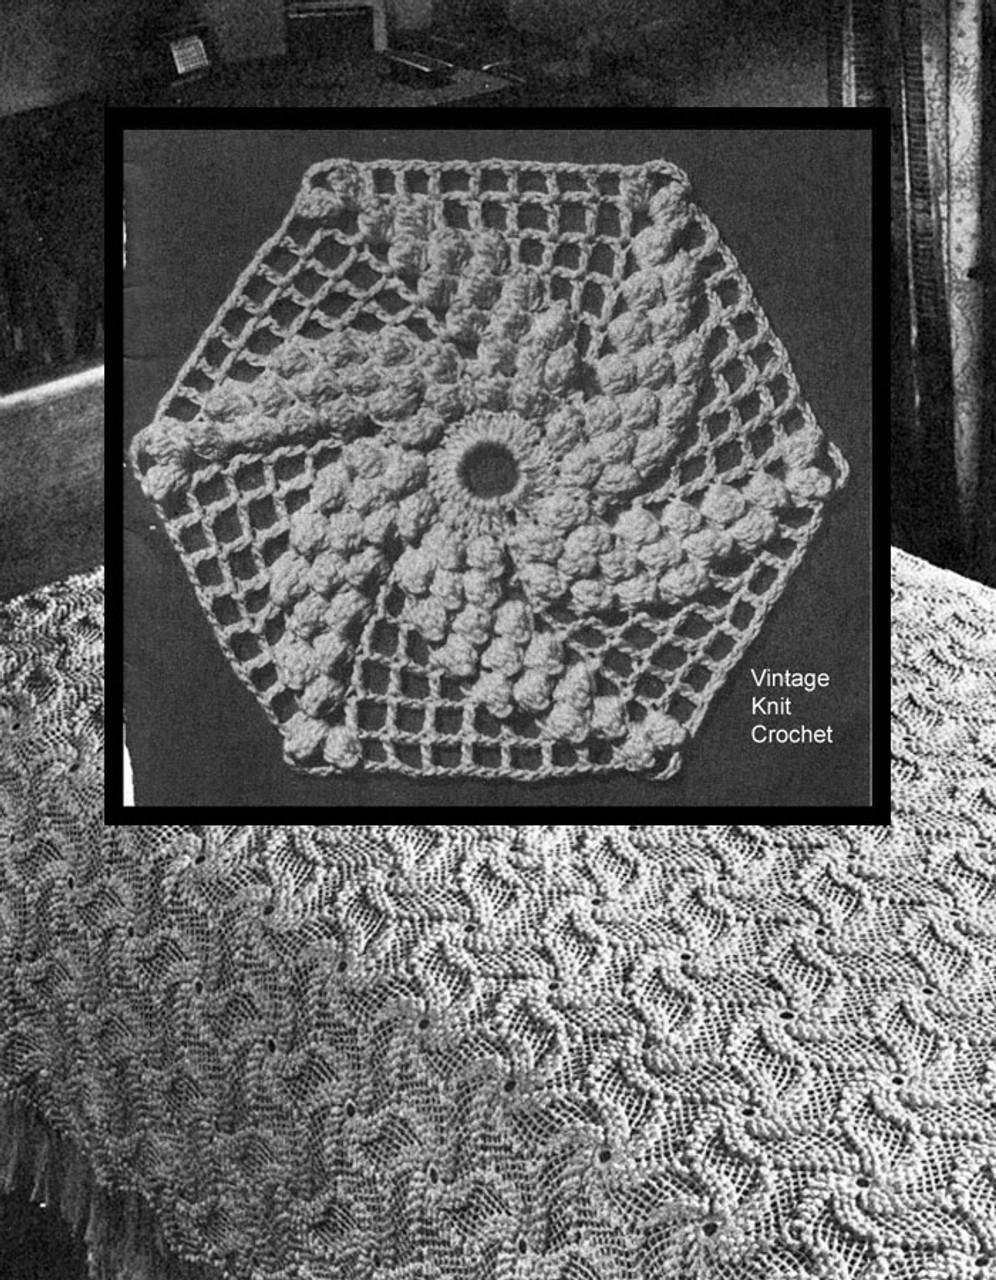 Crochet Pinwheel Bedspread pattern No 6127